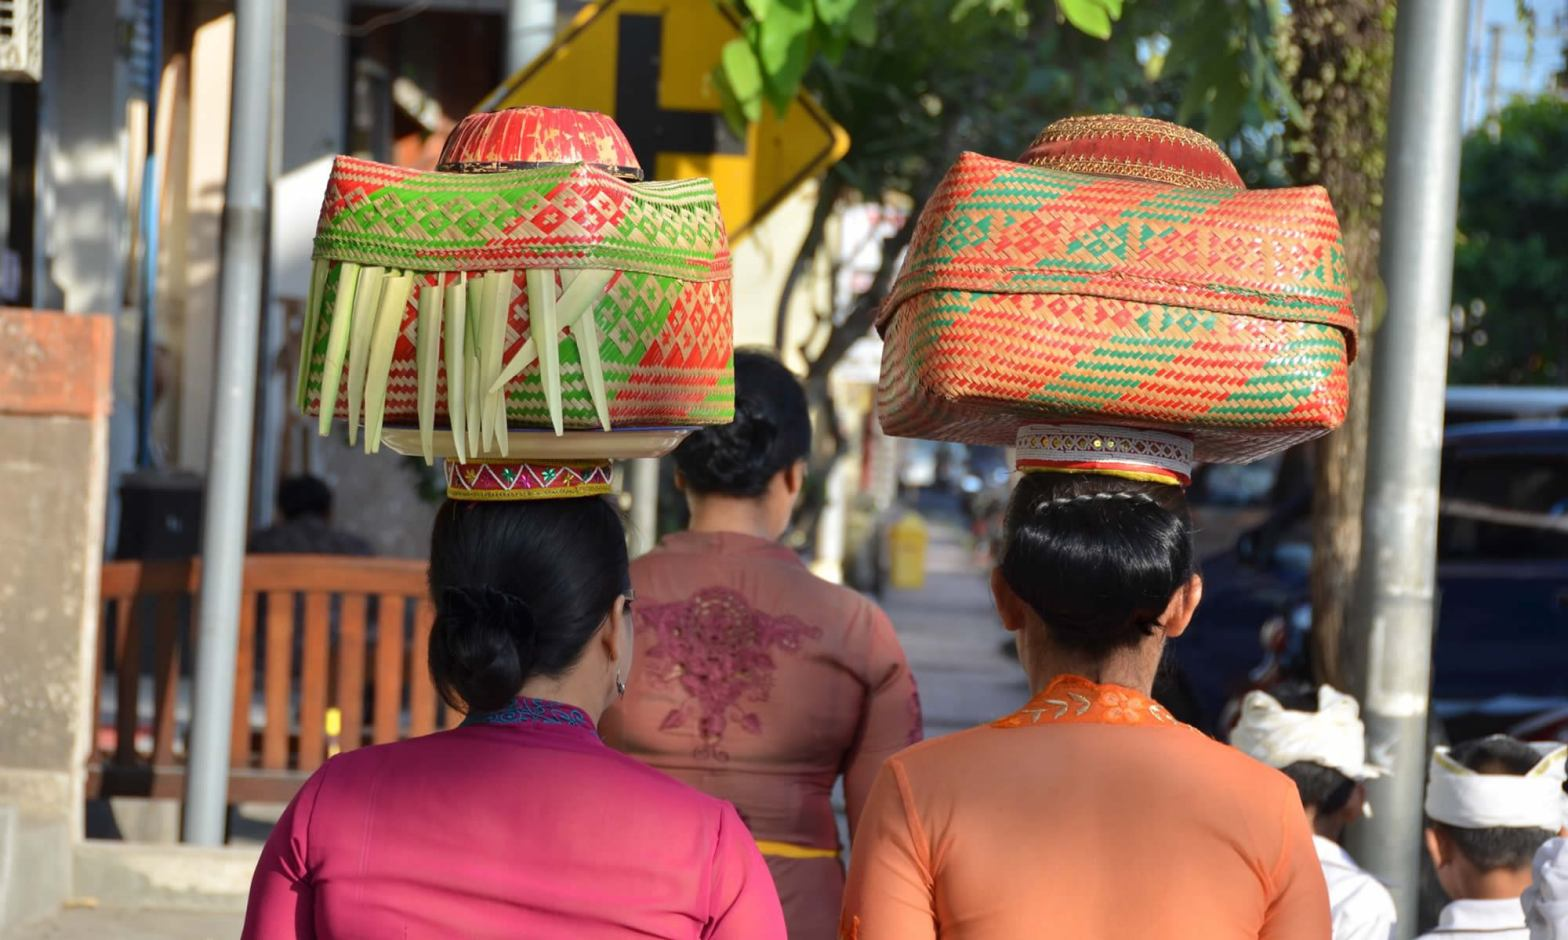 Women balance spiritual offering baskets on their heads in Ubud, Bali.